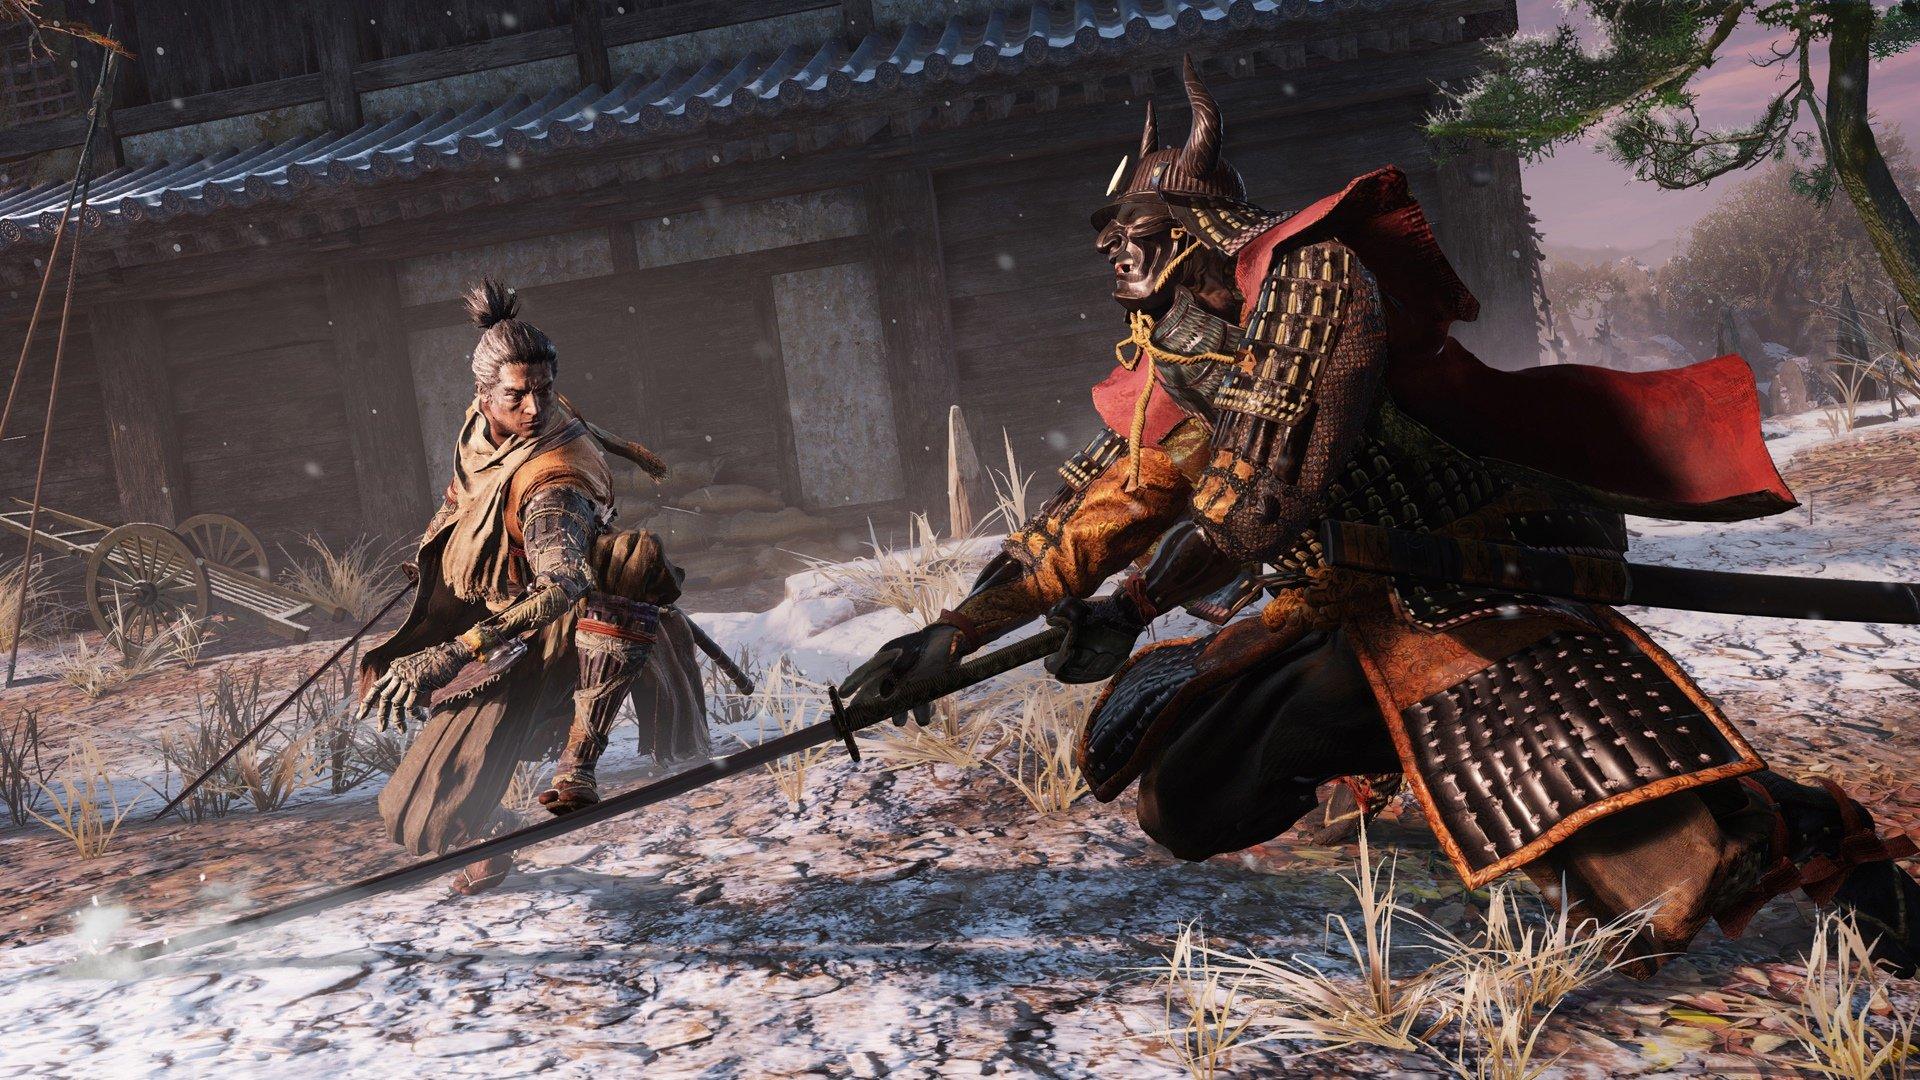 General Naomori Kawarada boss guide for Sekiro: Shadows Die Twice